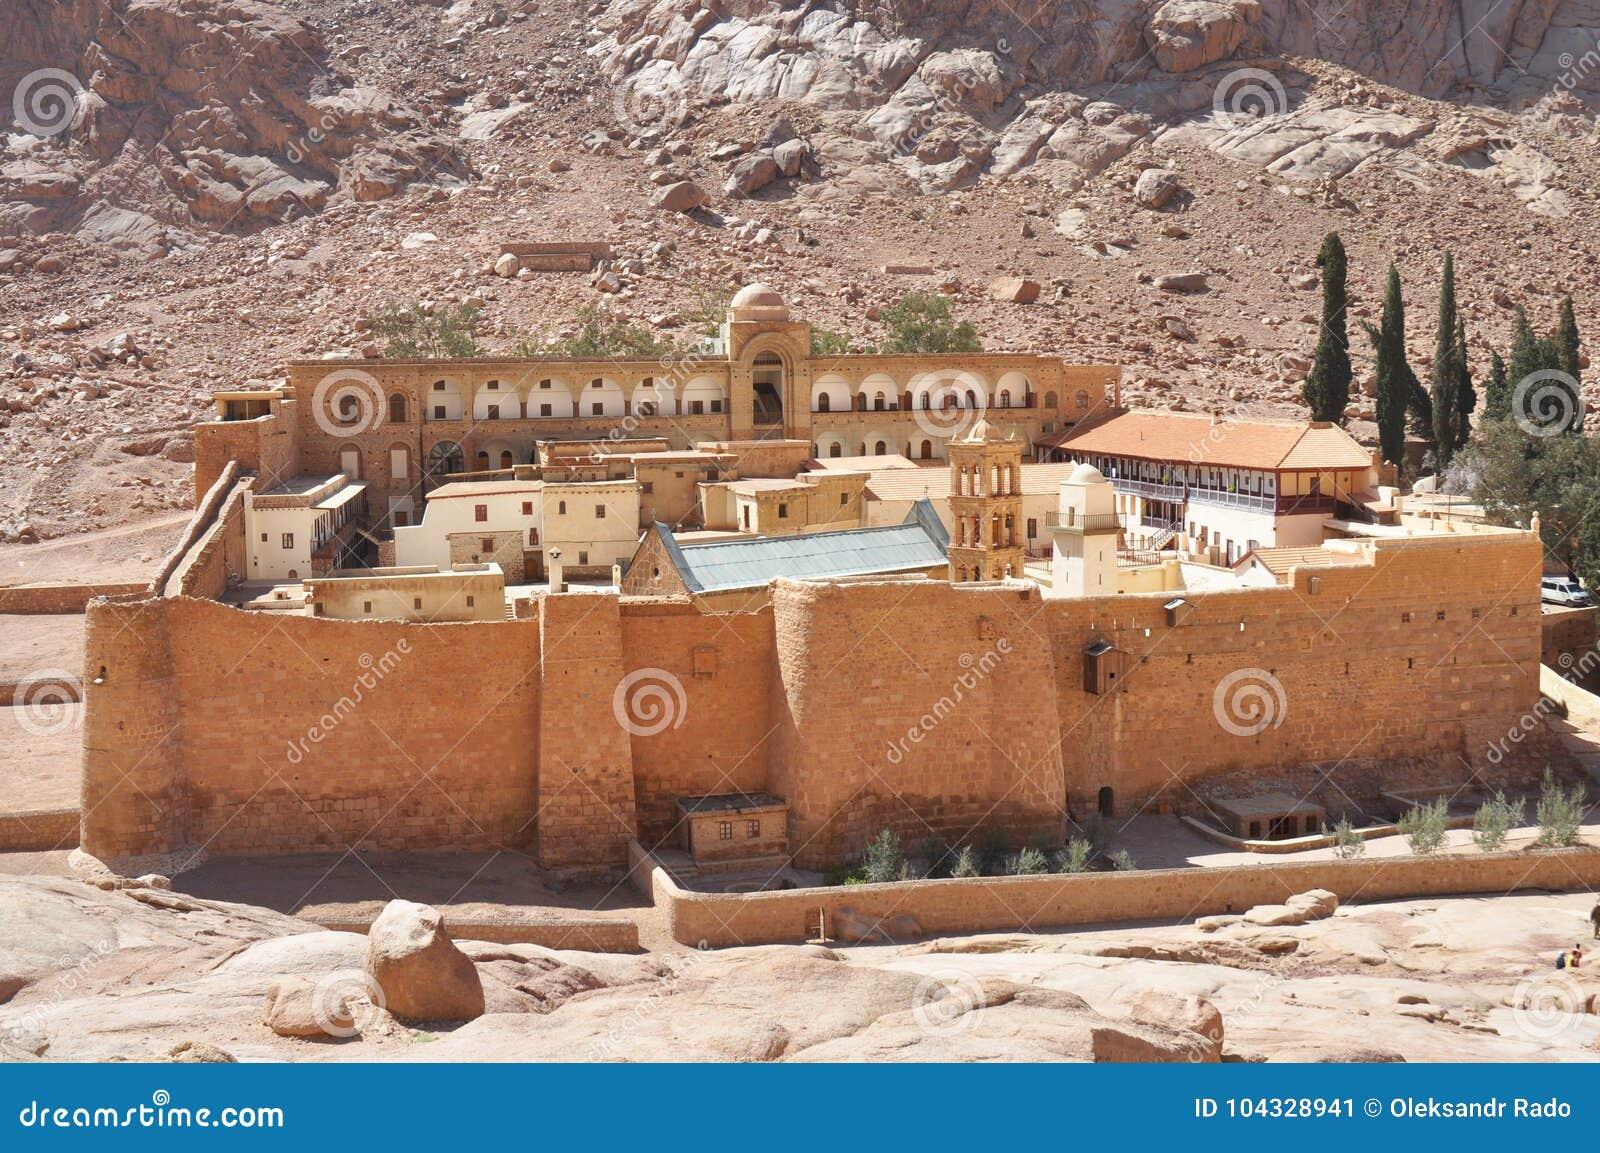 Beautiful Mountain cloister landscape in the oasis desert valley. Saint Catherine`s Monastery in Sinai Peninsula, Egypt